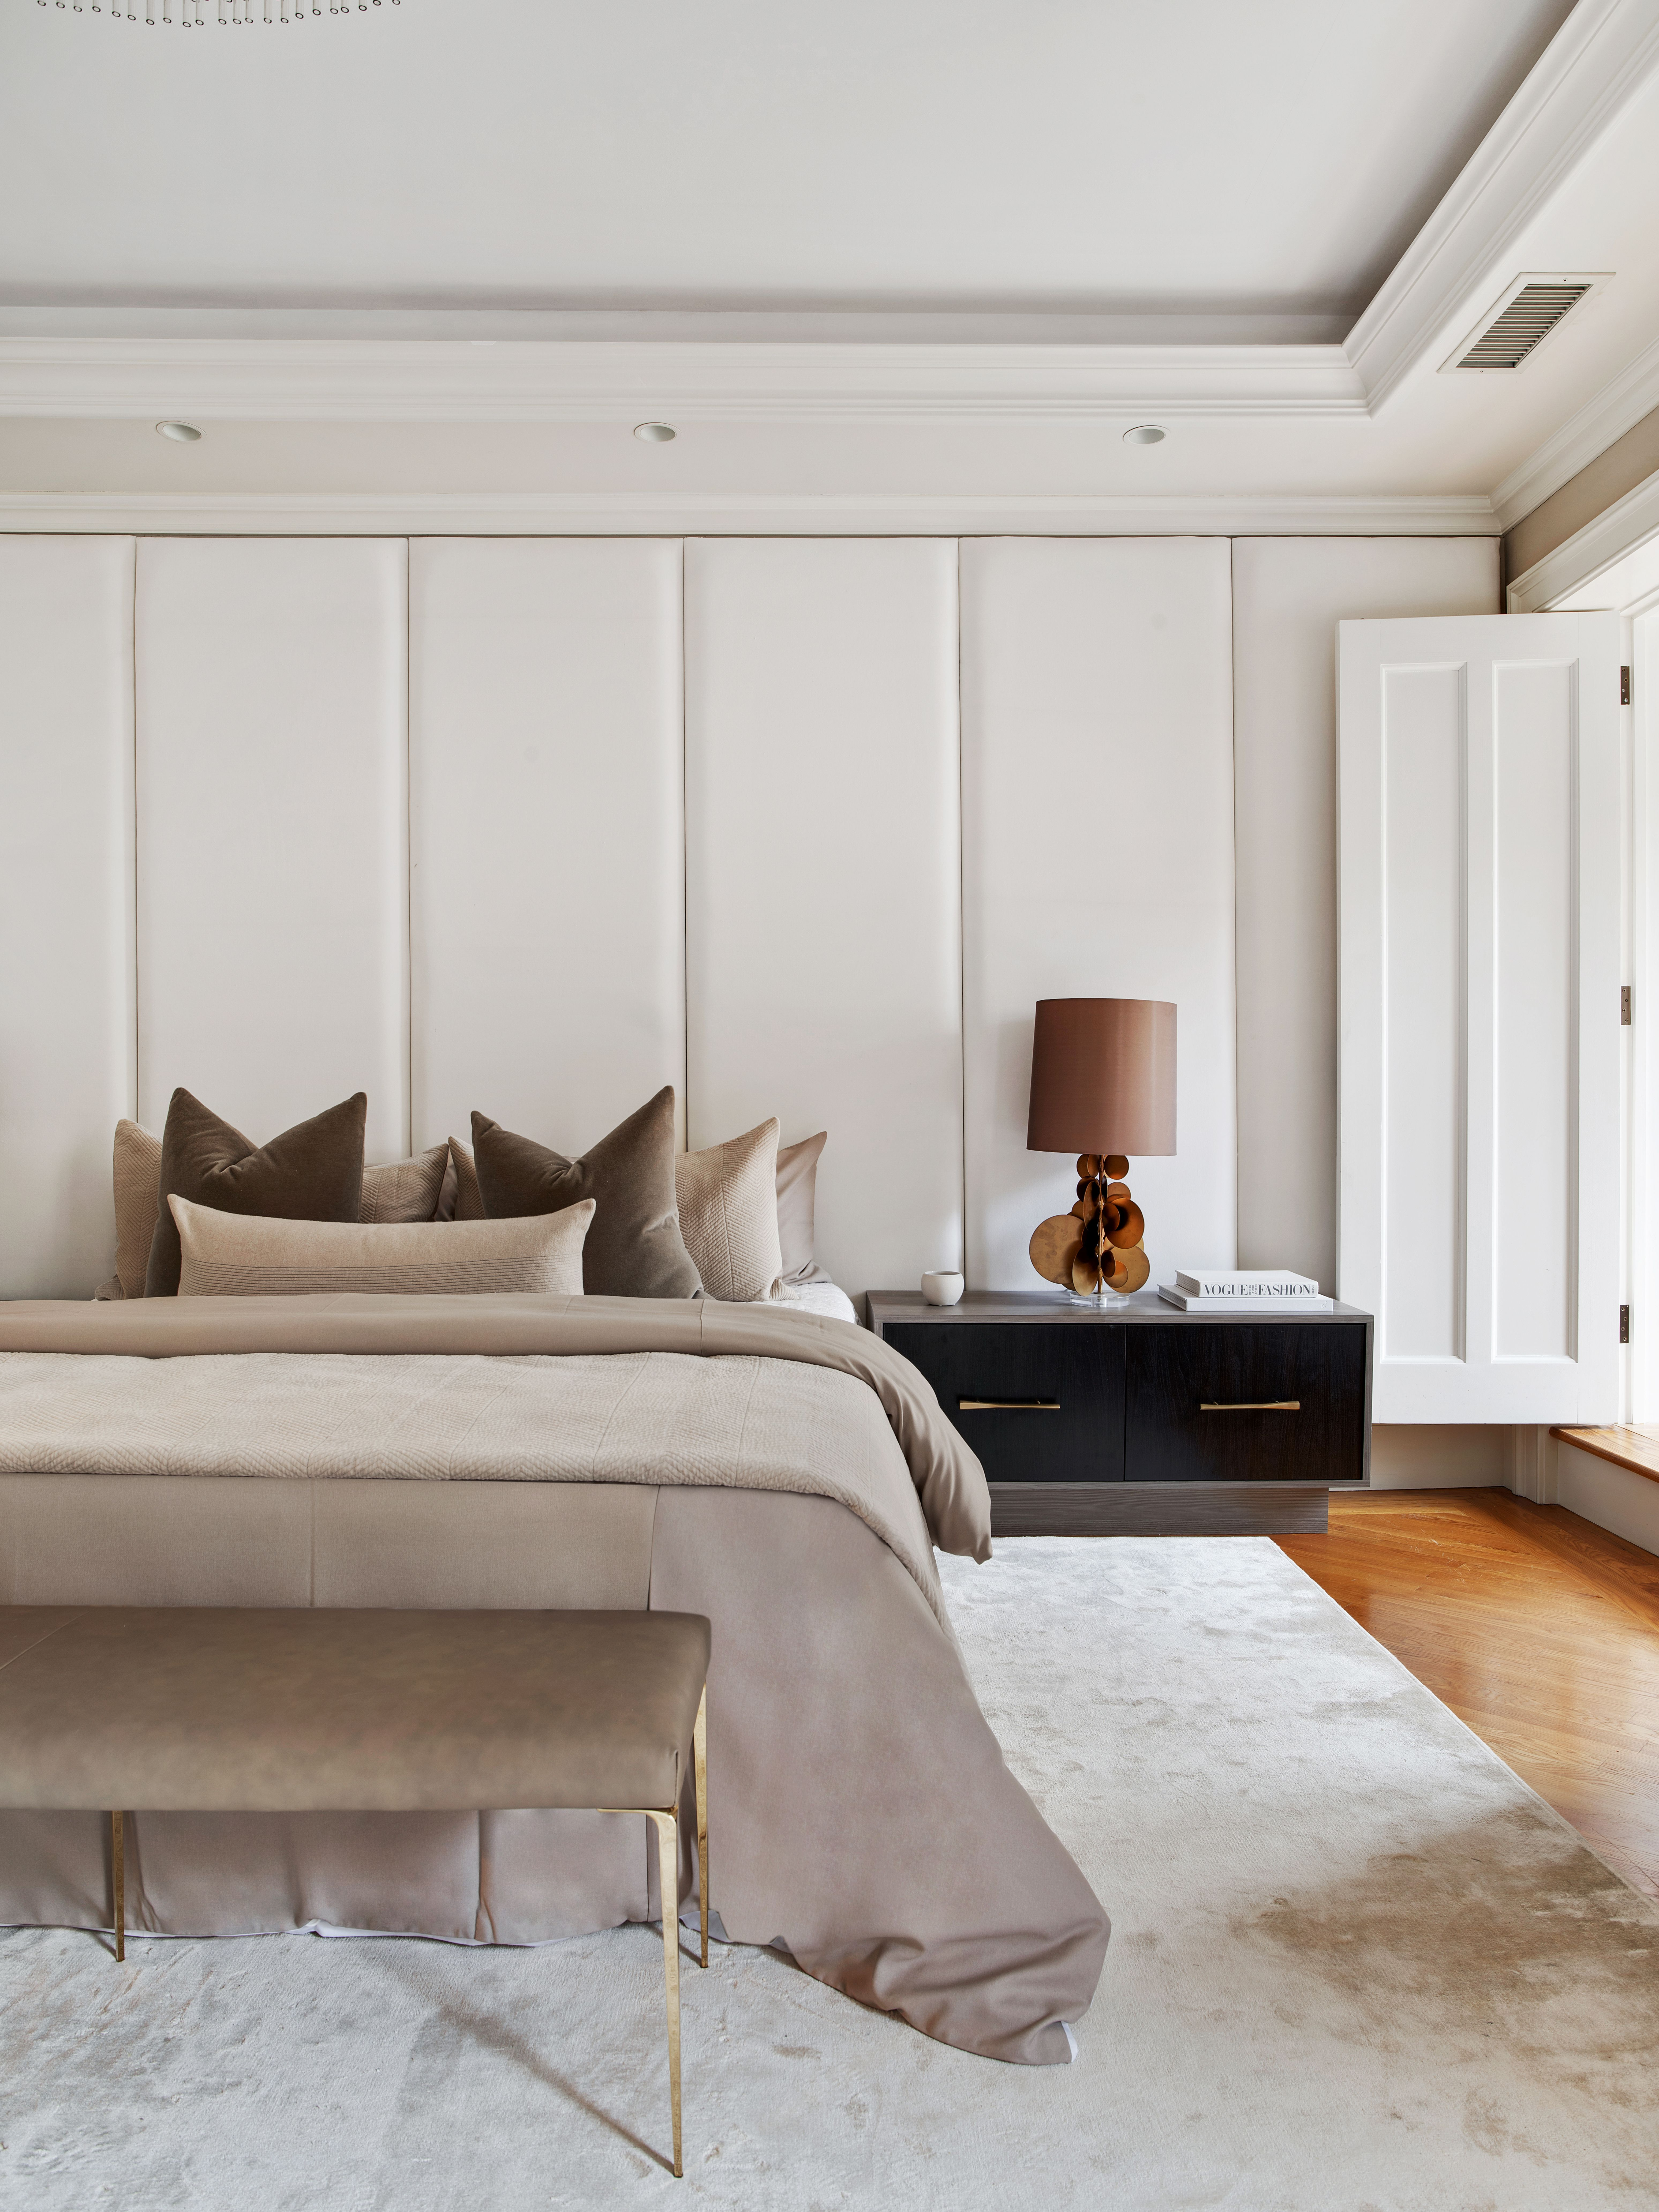 Design By Img Bedroom Interior House Interior Interior Design